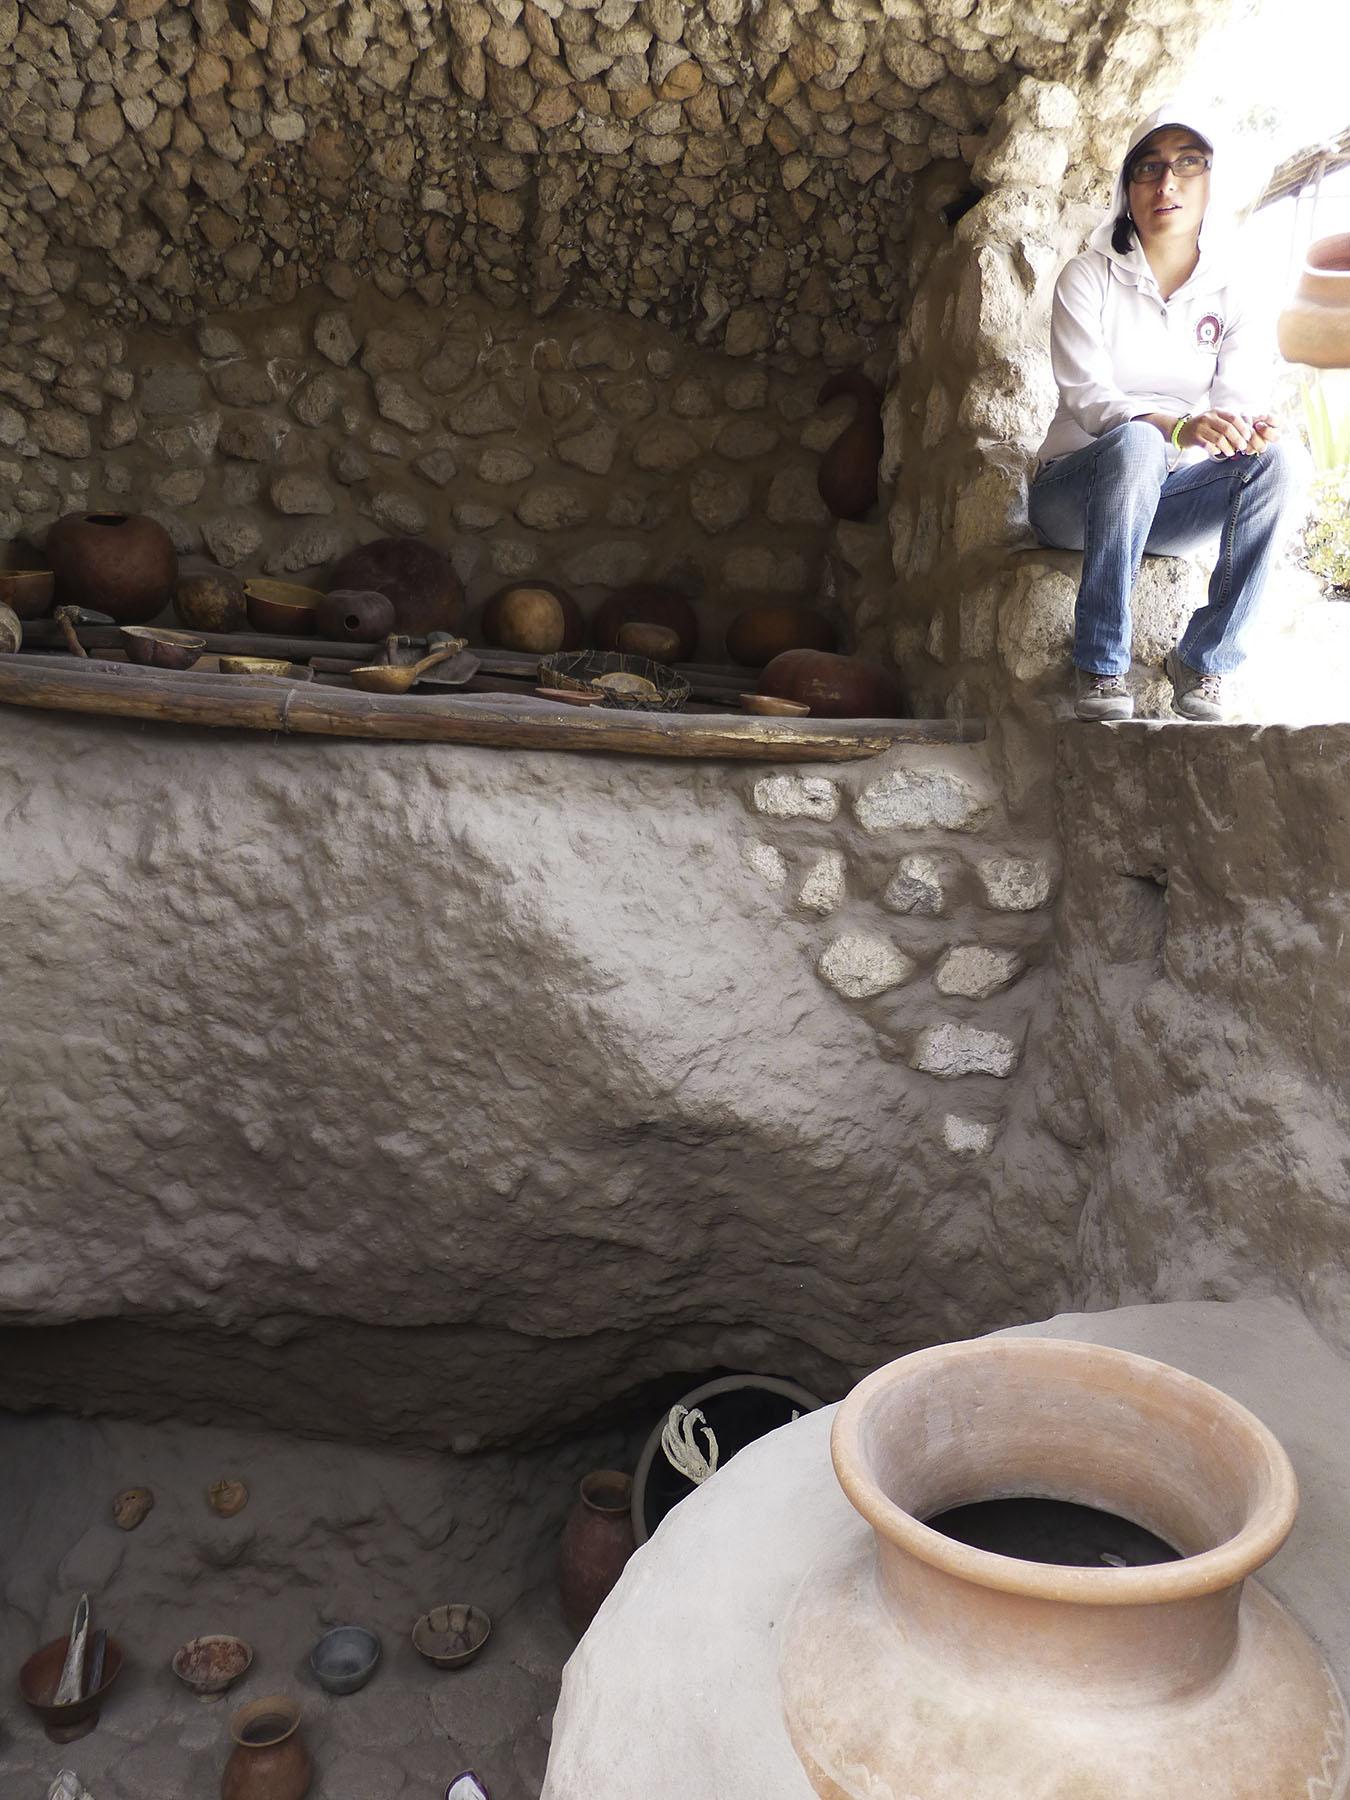 Tour through Museo Inti Ñan